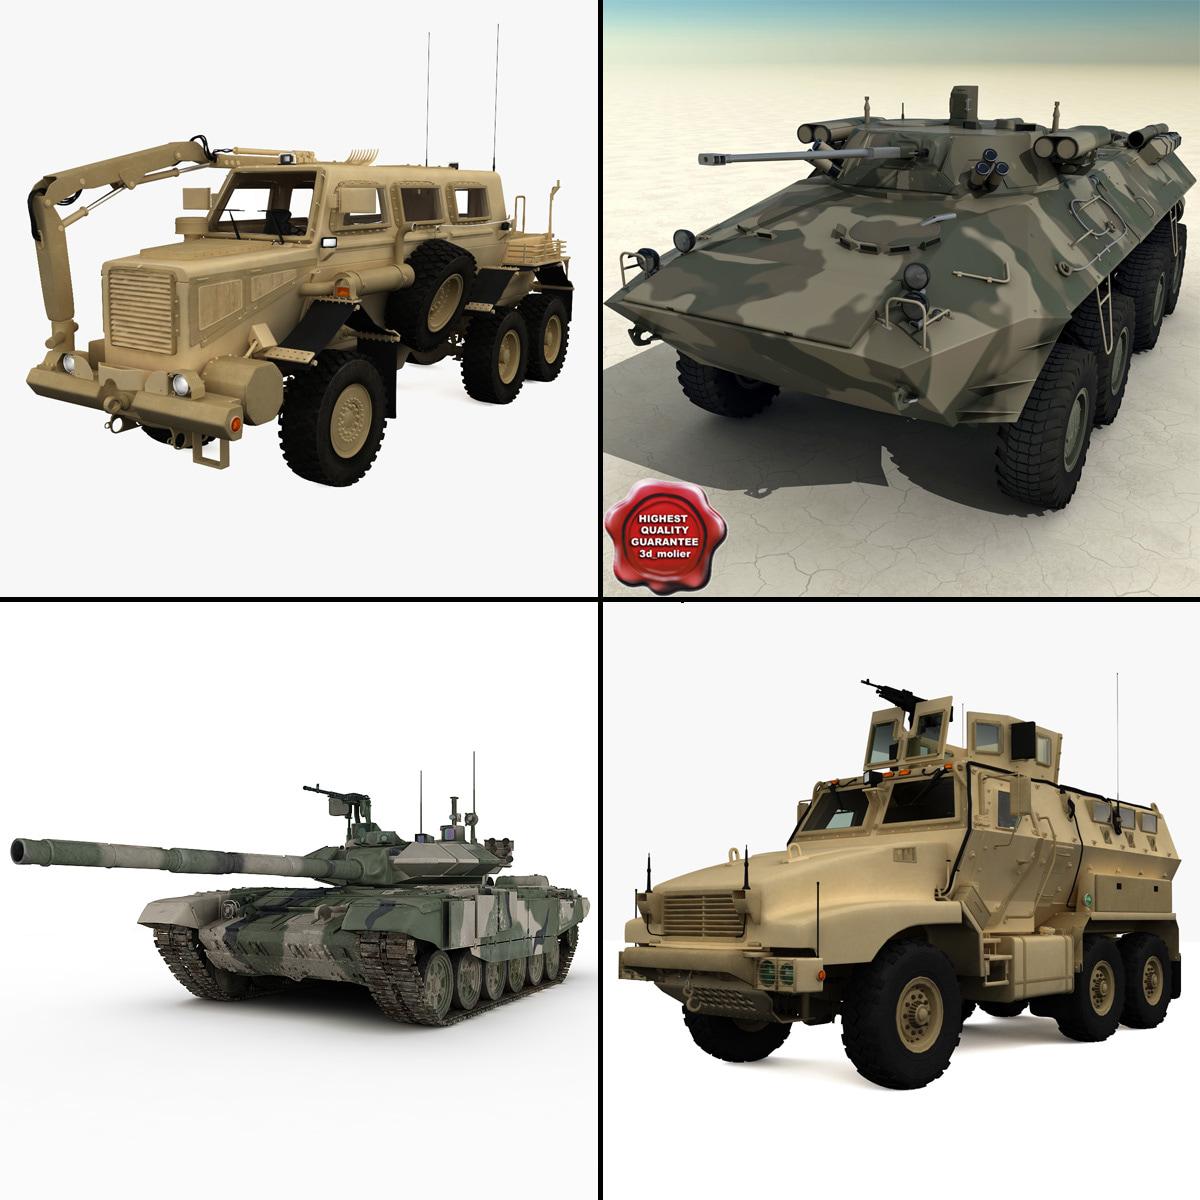 Tanks_Collection_V2_000.jpg